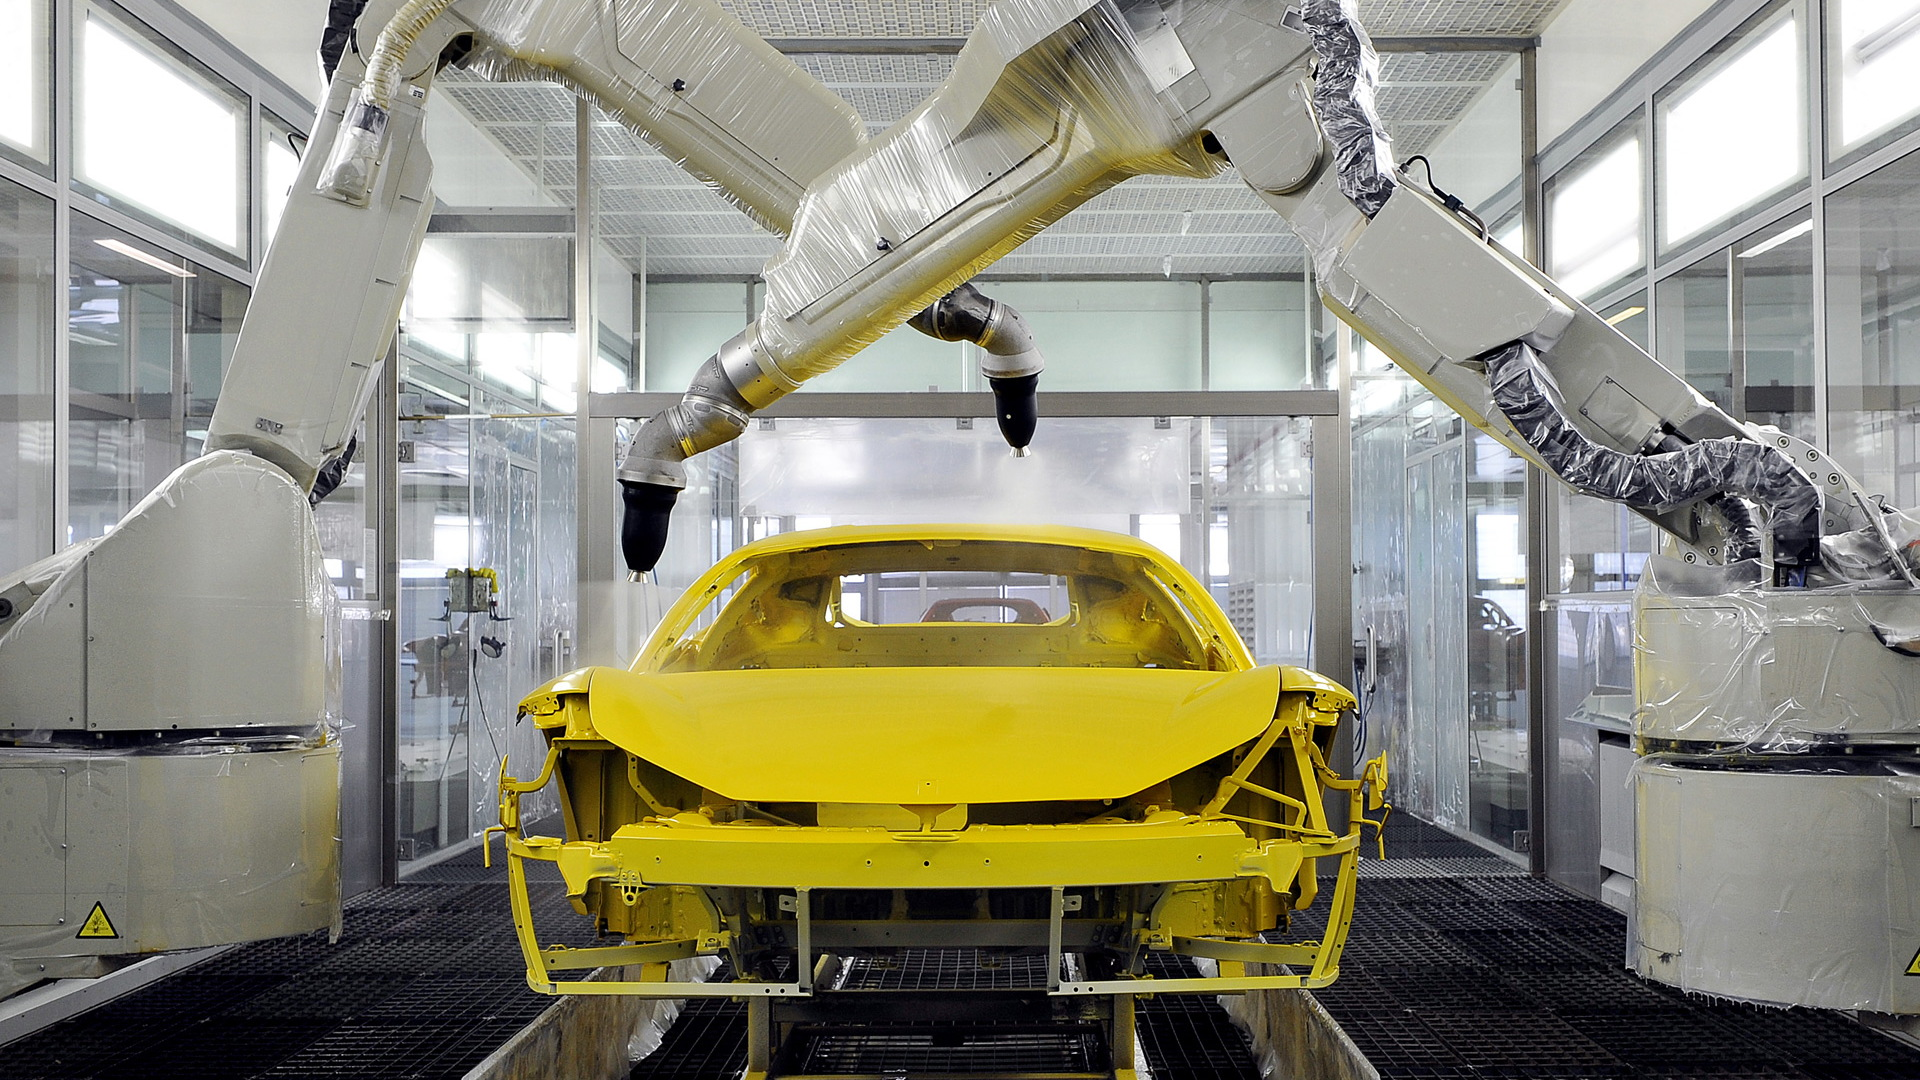 Ferrari factory in Maranello, Italy